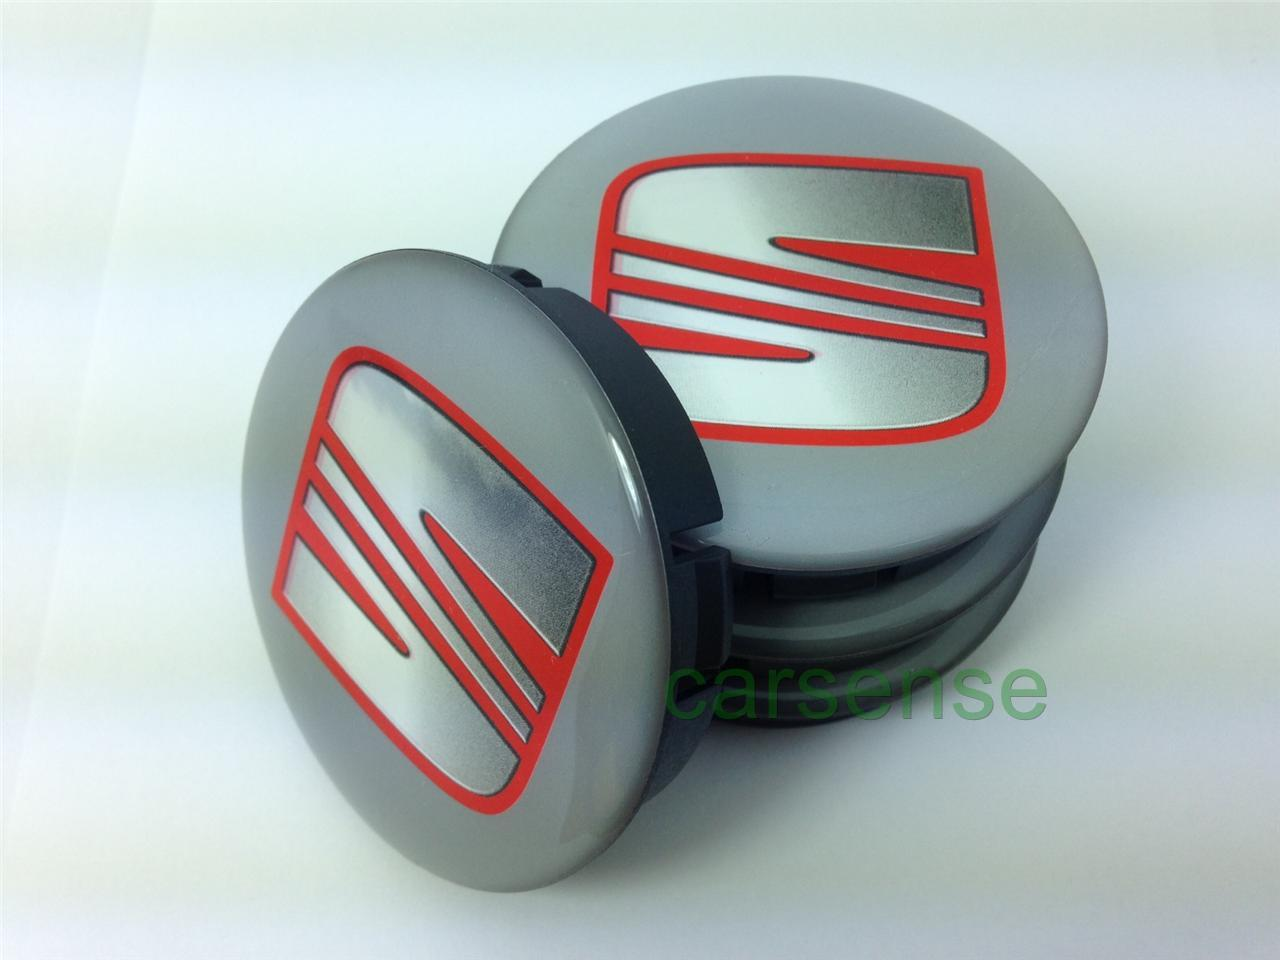 seat silicone 60mm autocollant centre de roue cache moyeu jante ebay. Black Bedroom Furniture Sets. Home Design Ideas